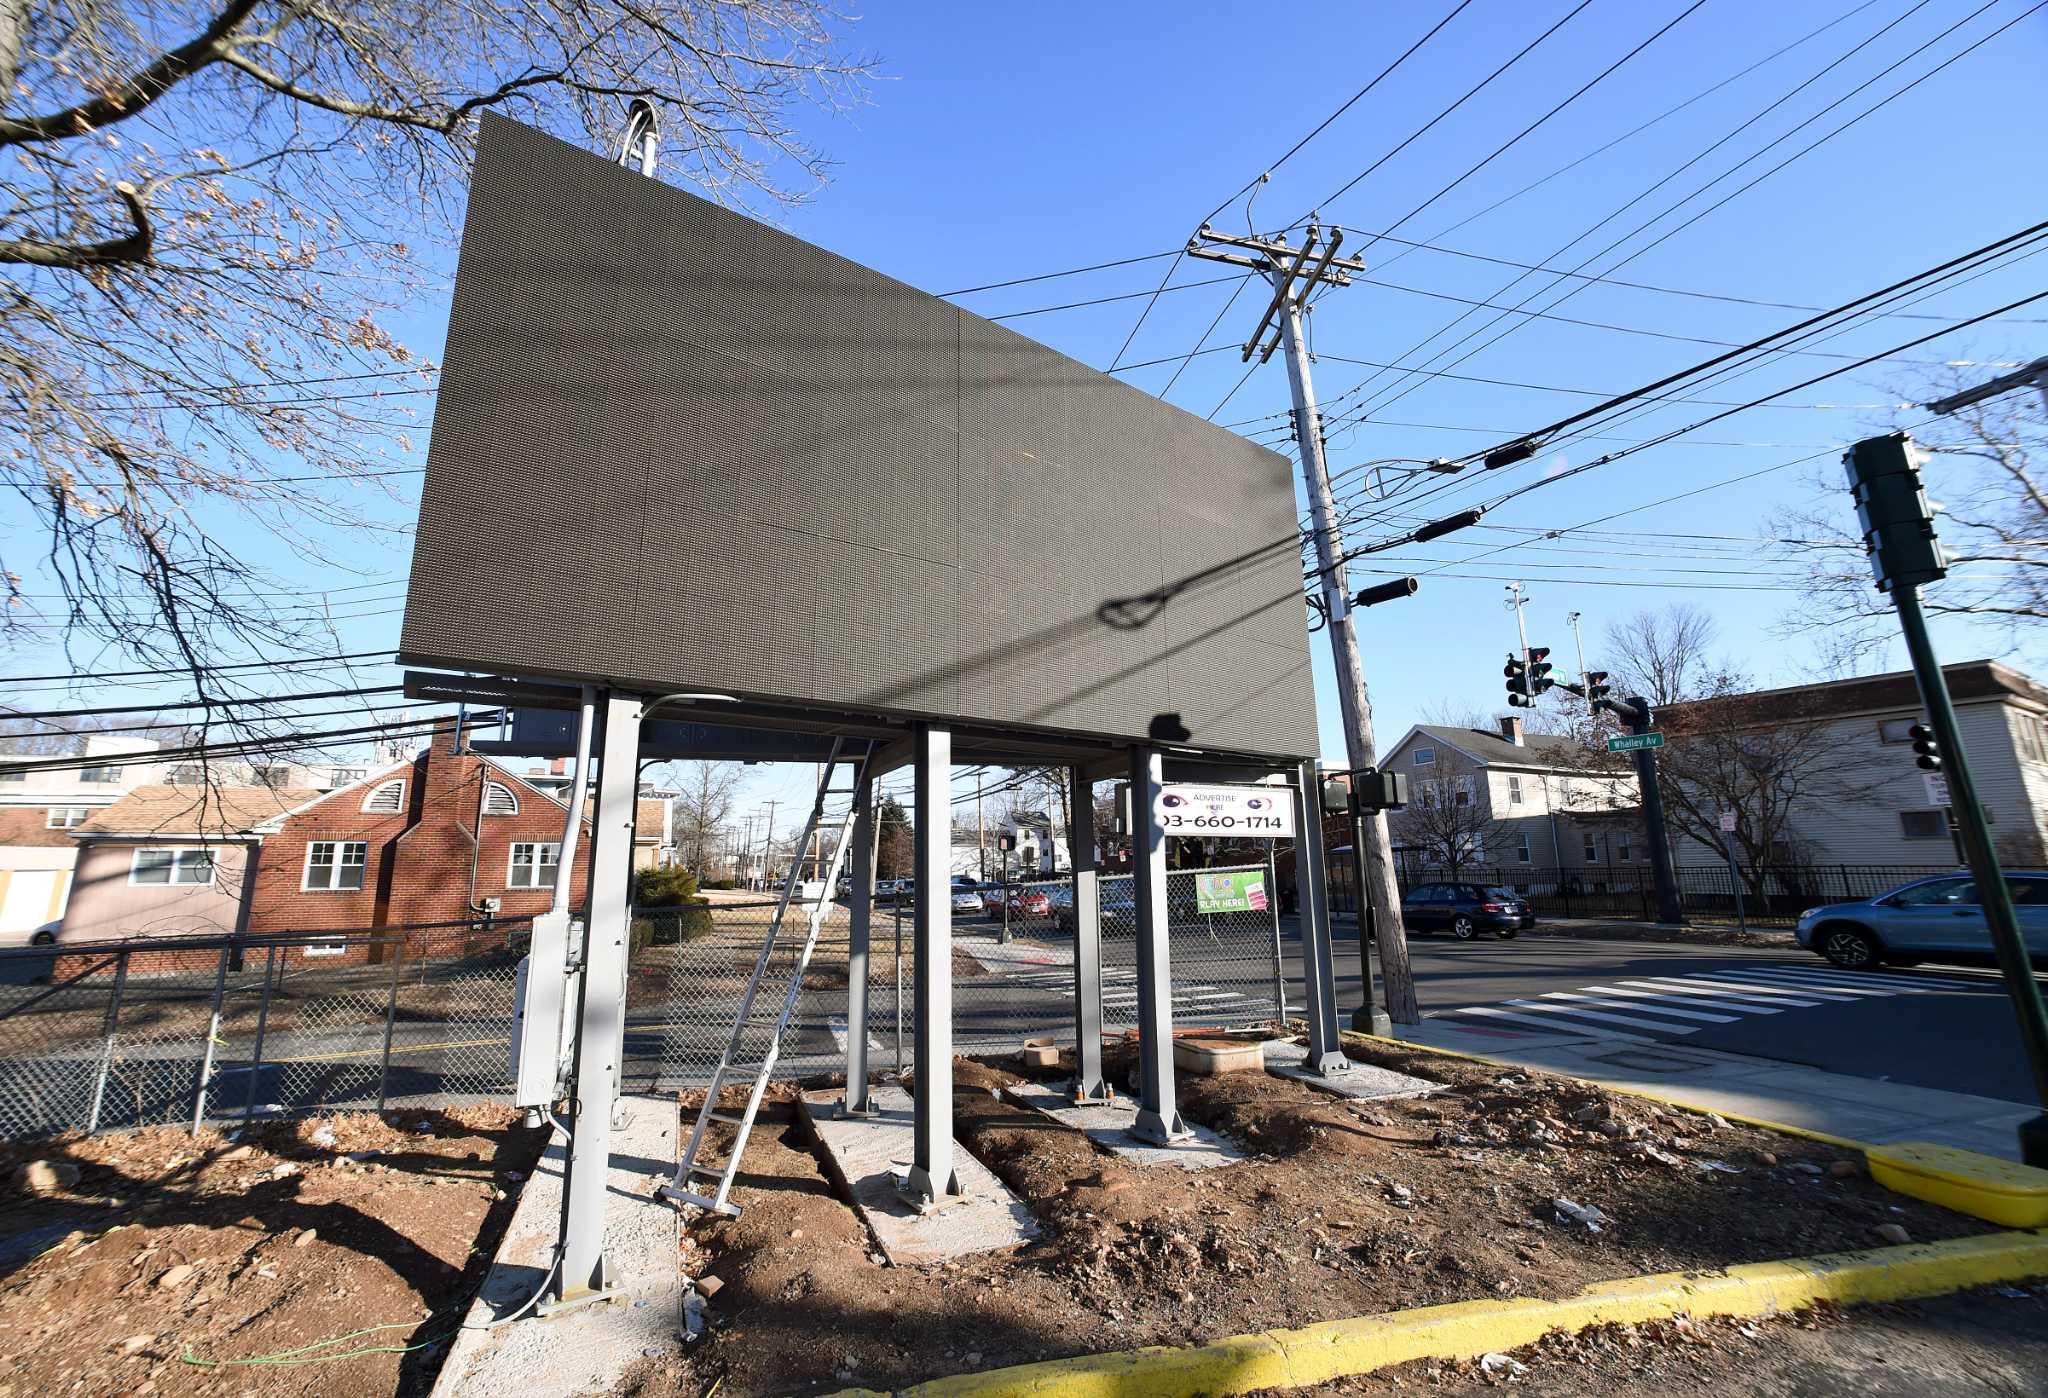 Colleges In Ct >> Some New Haven officials blast businessman's billboard plan - New Haven Register